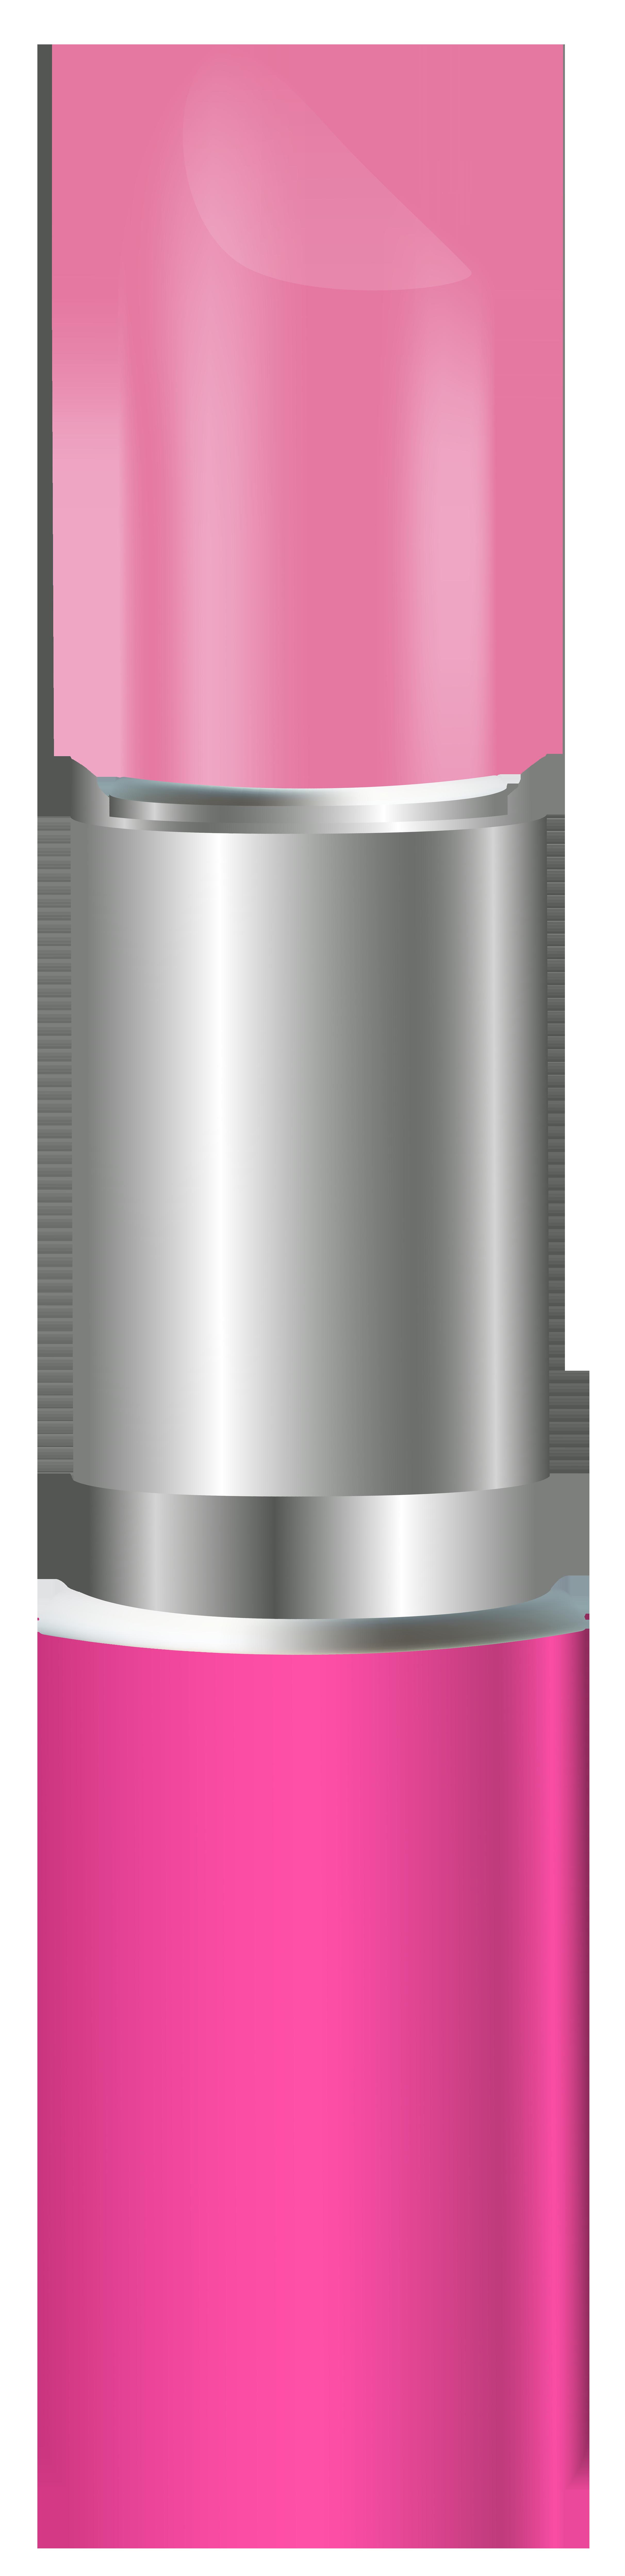 Lipstick transparent clip art image